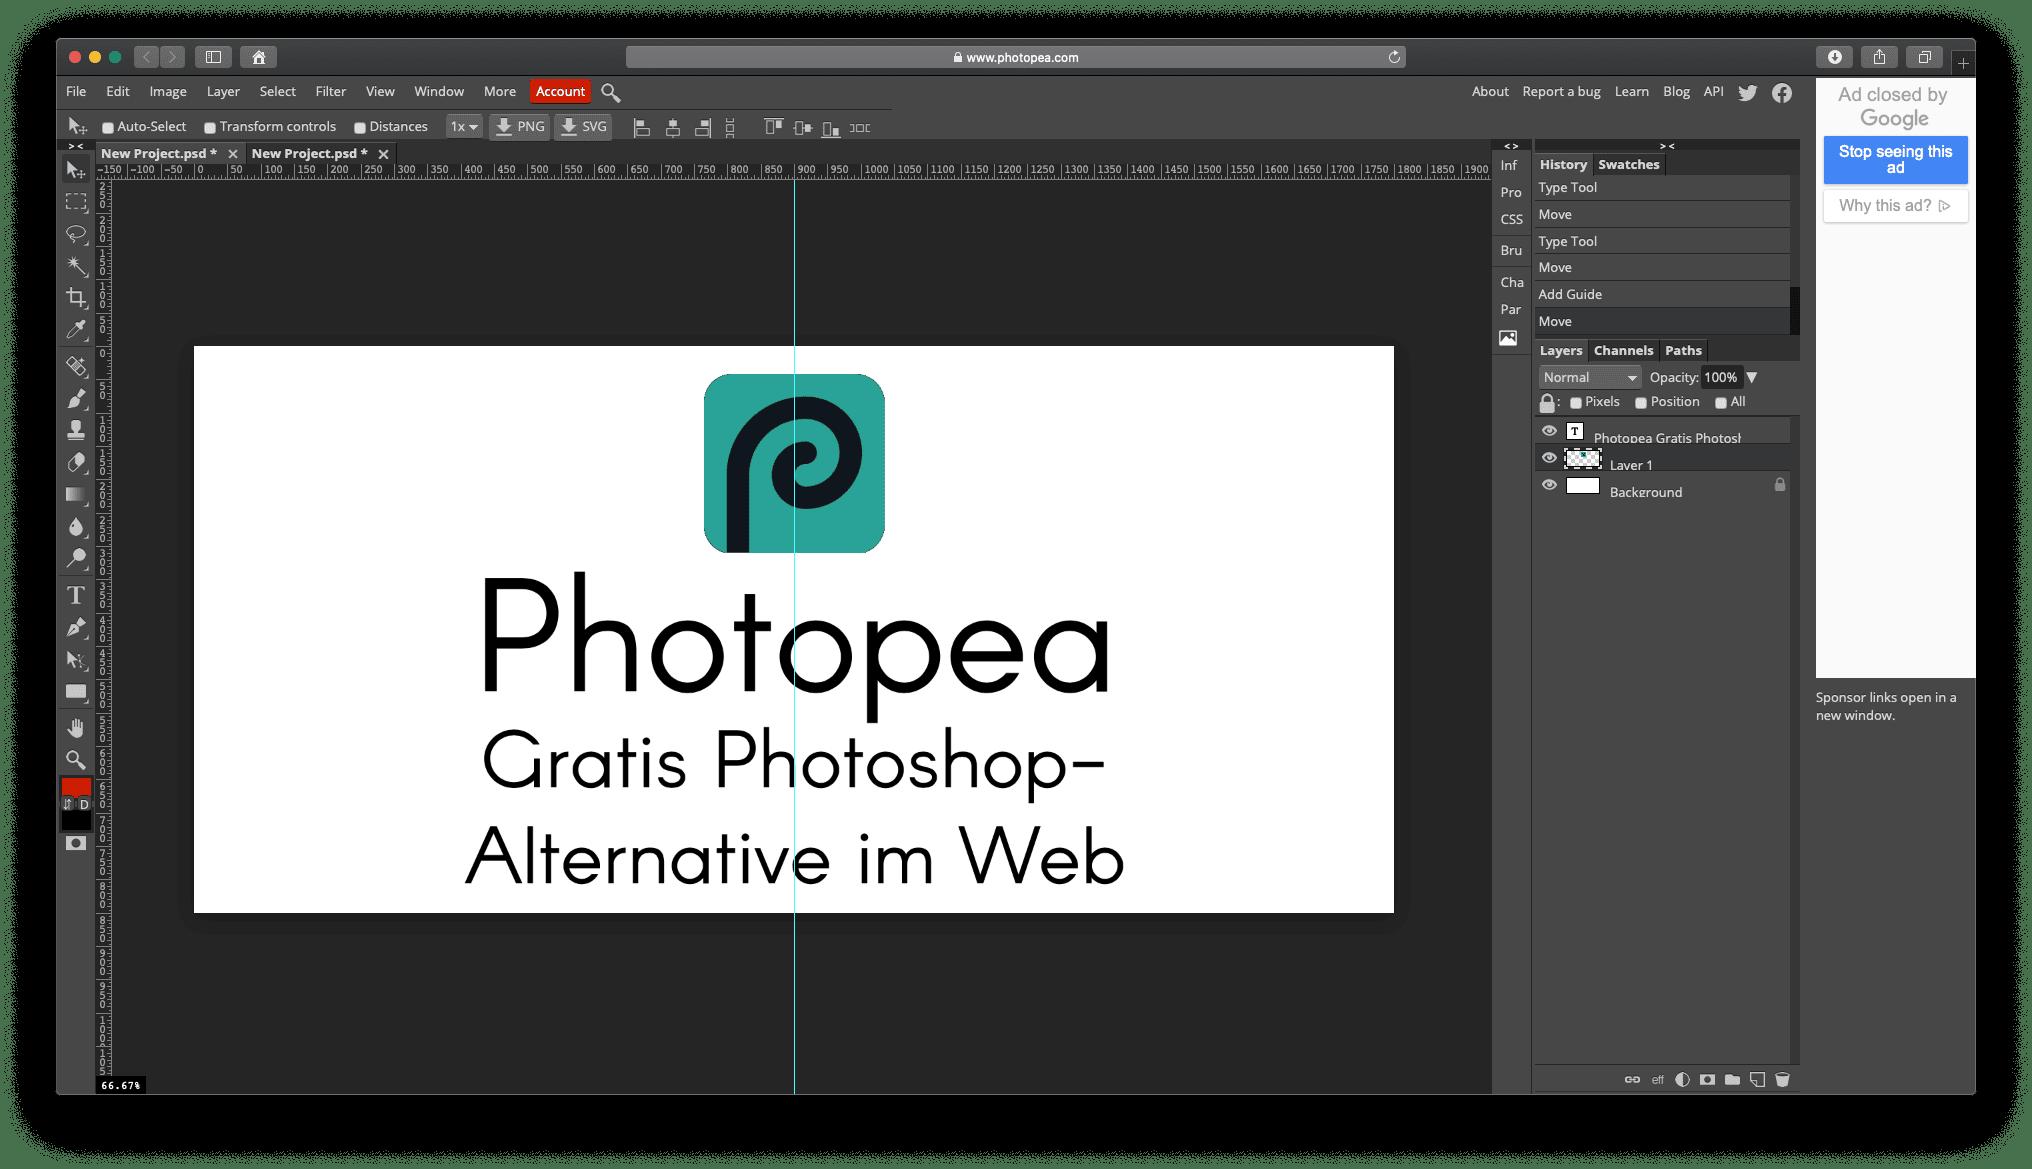 Photopea – Gratis Photoshop Alternative ohne Download » Sir Apfelot